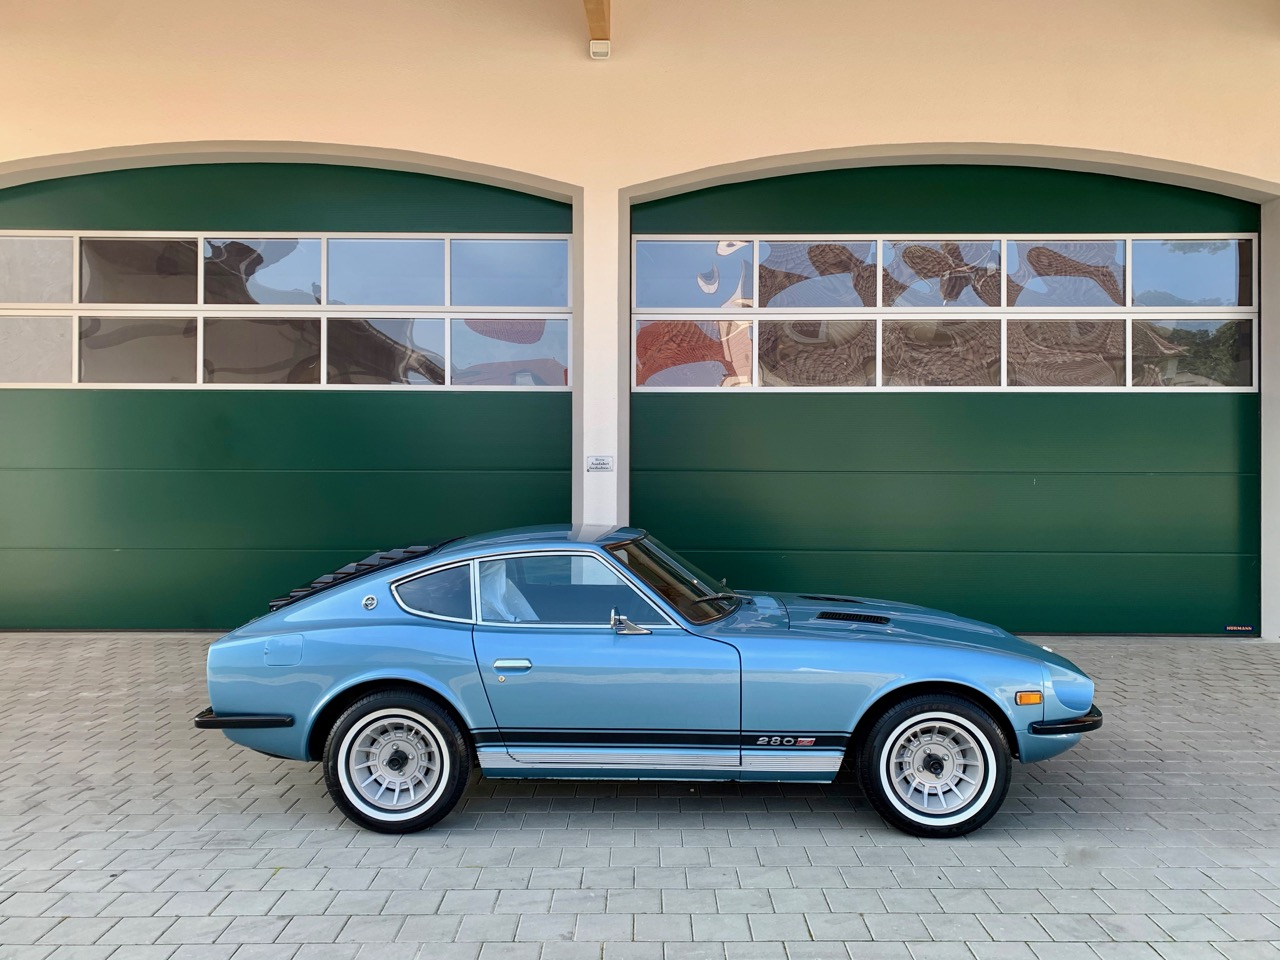 Metallic Blau 1977 Datsun 280z Original Auto zu verkaufen